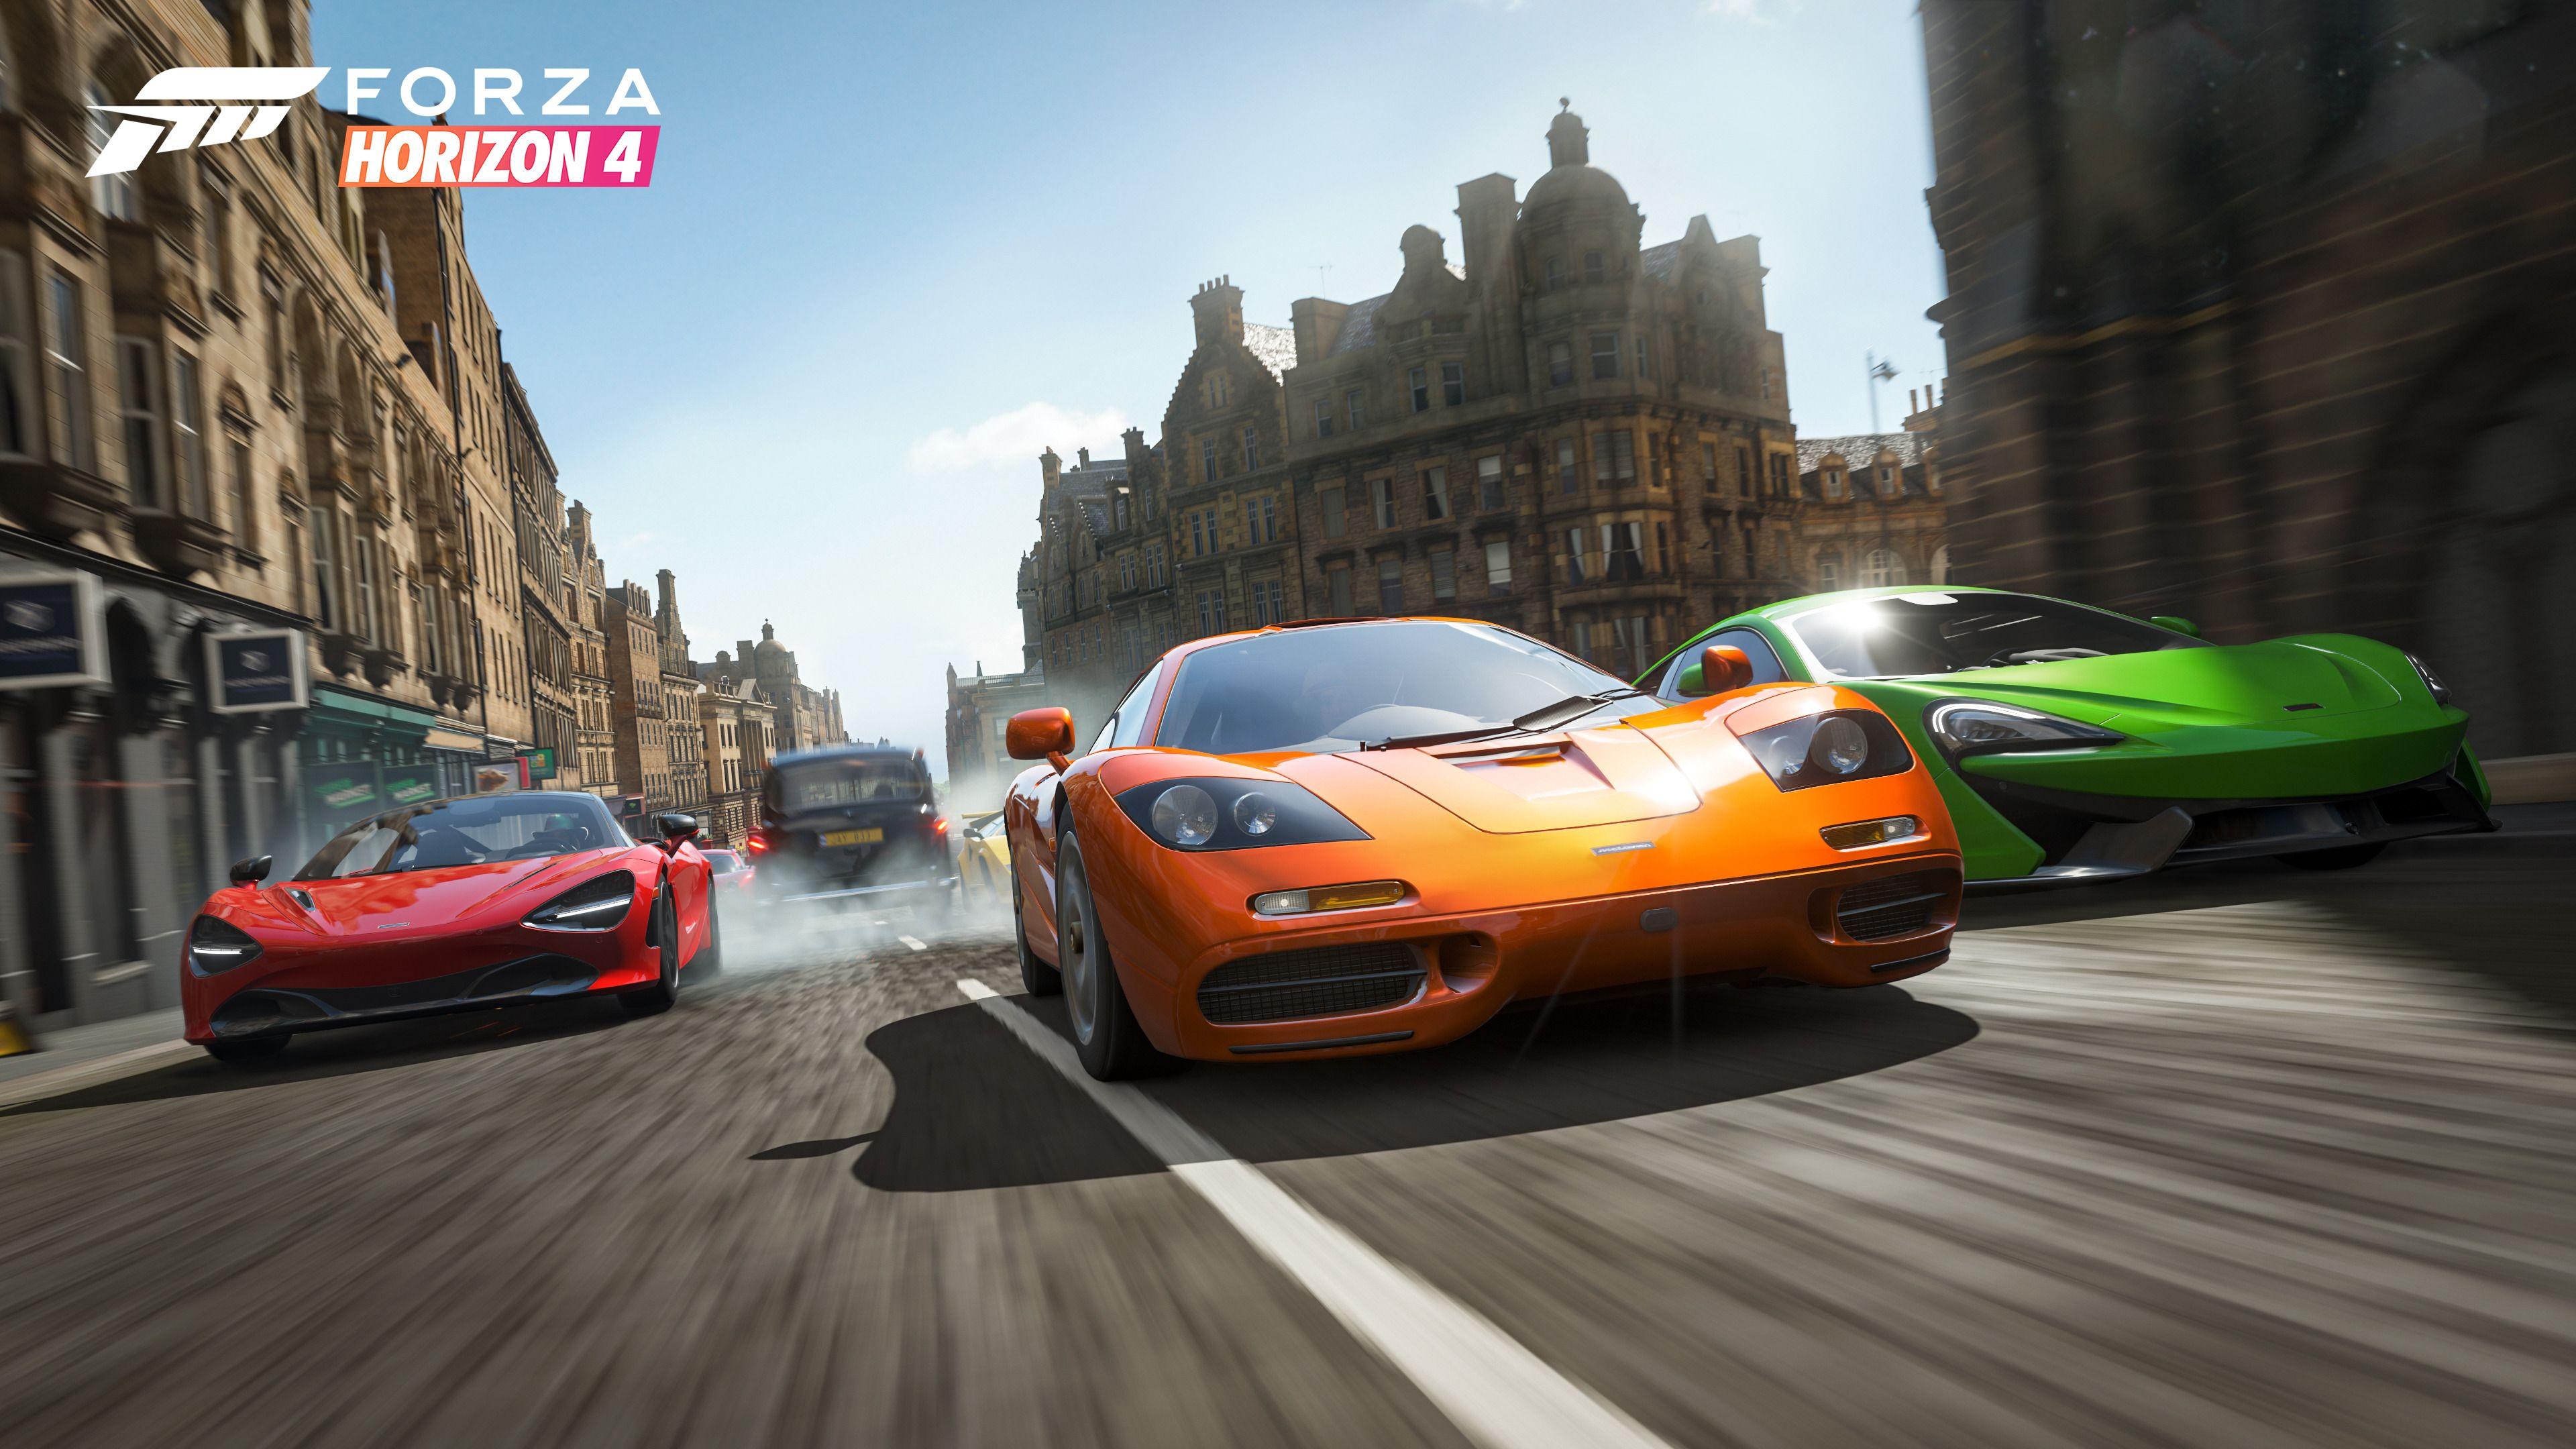 Image Result For Racing Games Wallpaper Forza Horizon Forza Horizon 4 Forza